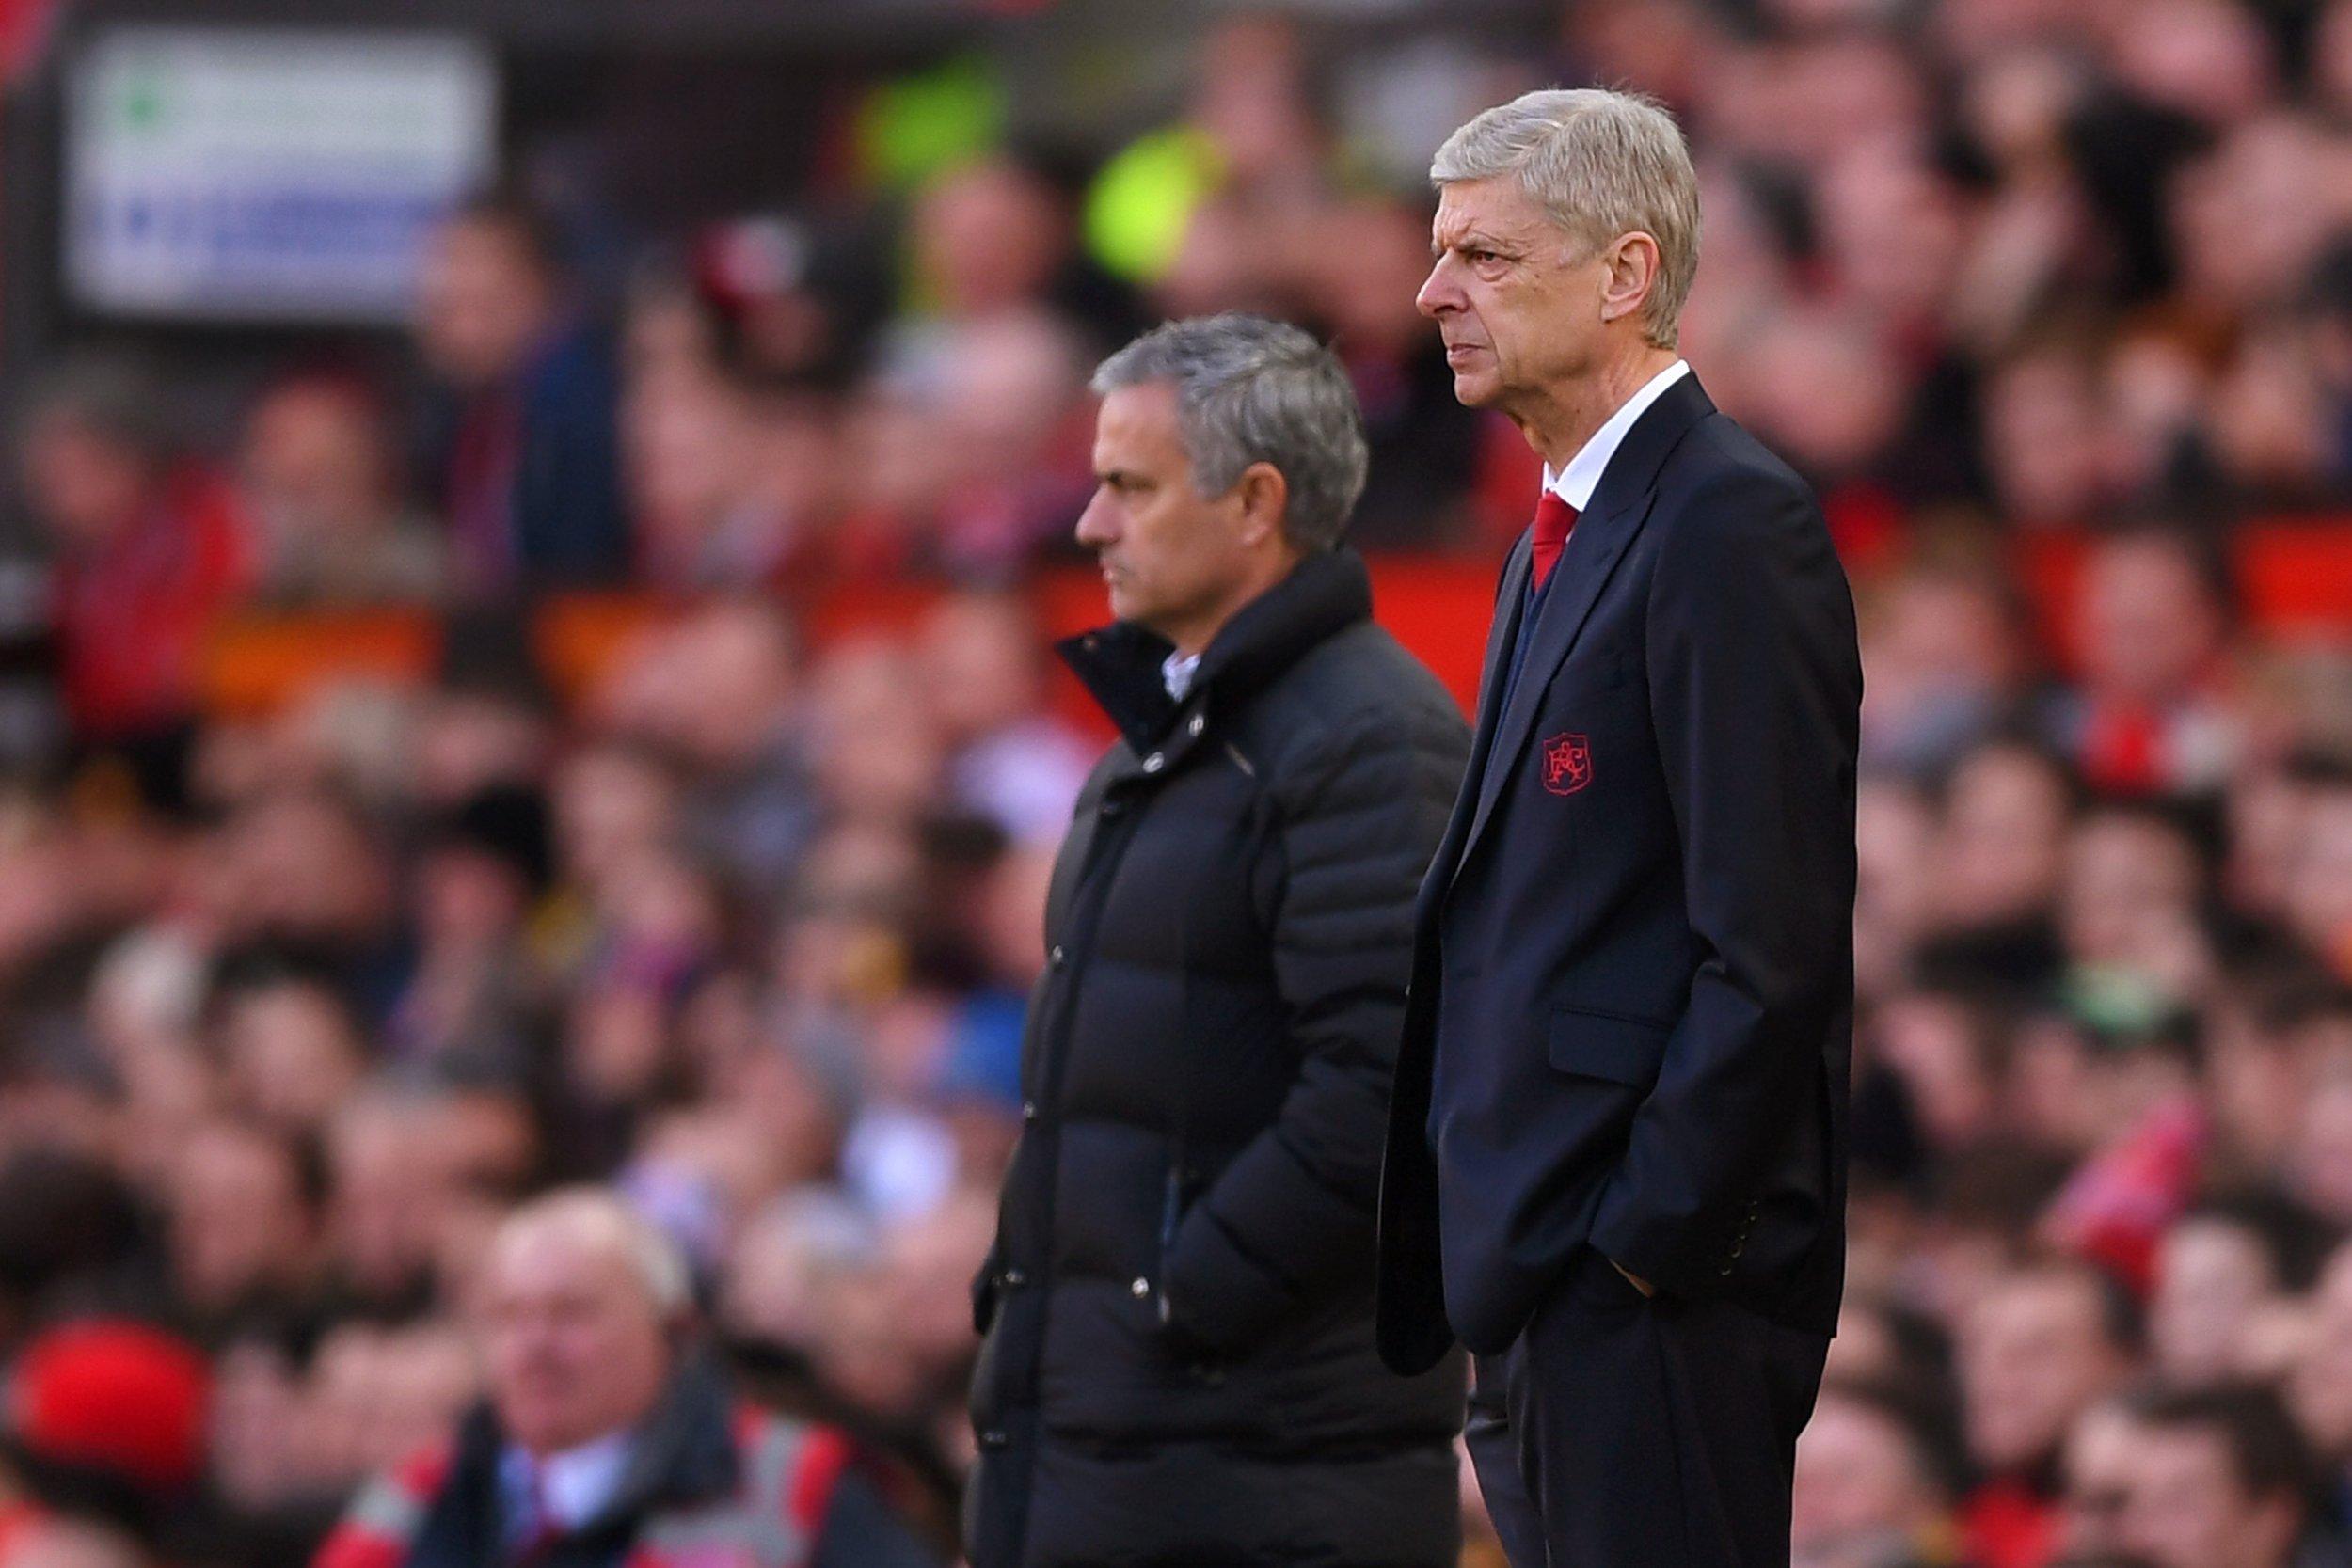 Mourinho and Wenger